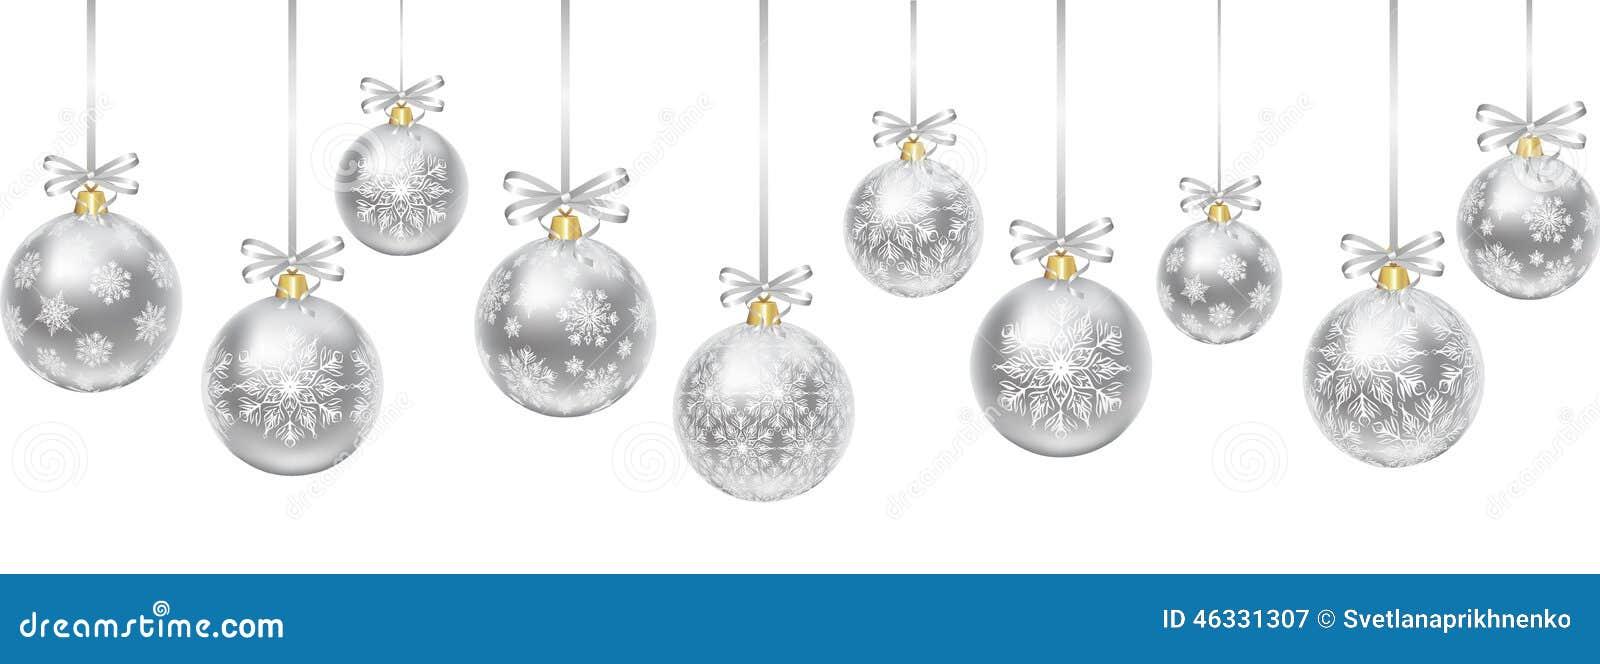 silver baubles stock vector image 46331307 crystal ball clip art pics crystal ball clip art free